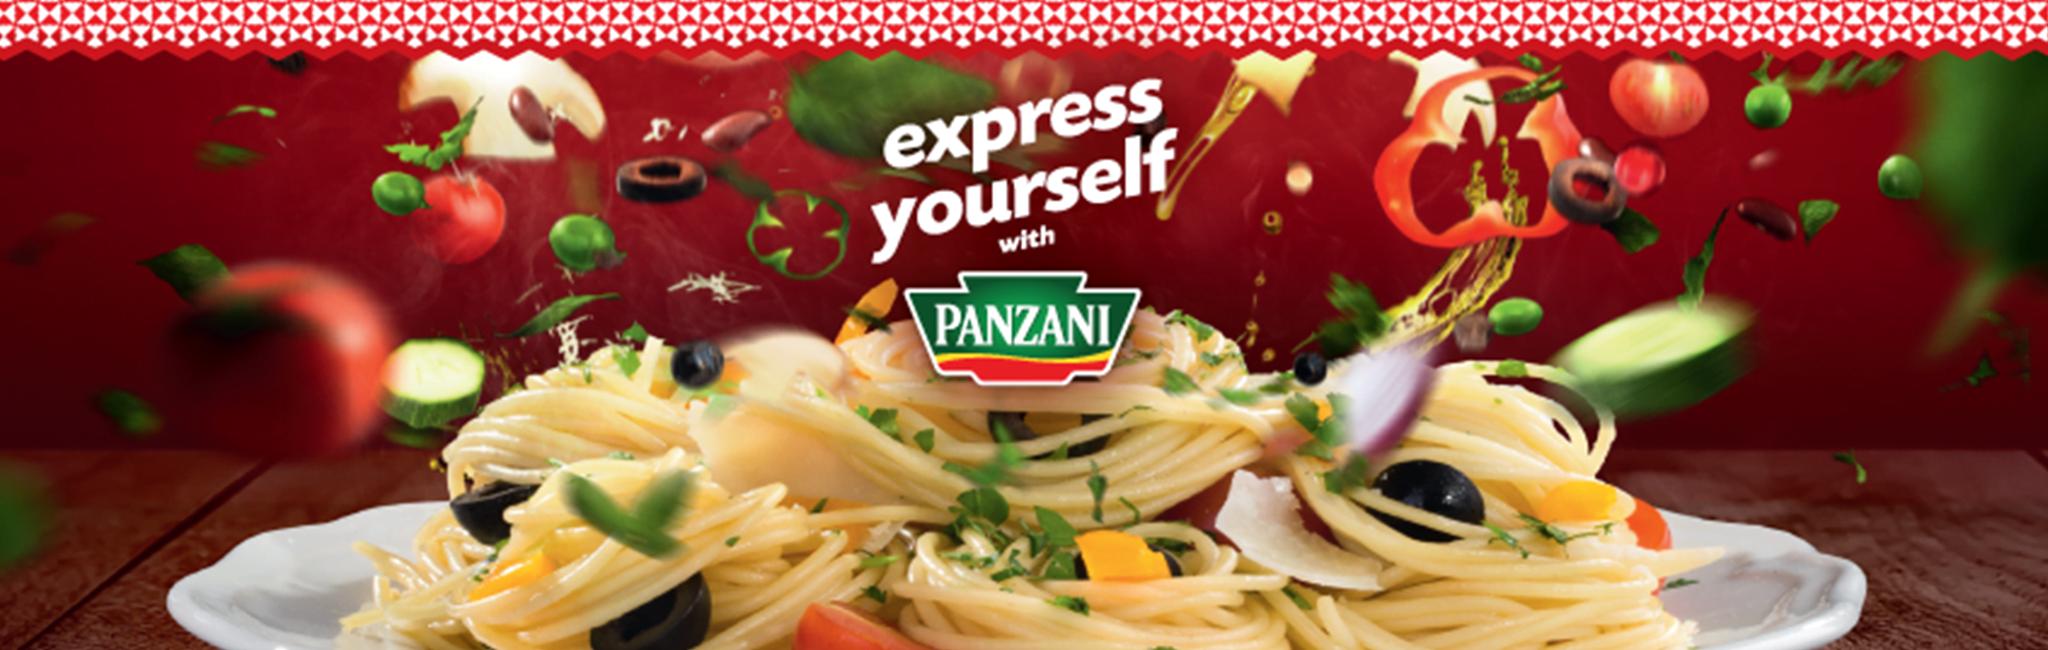 Panzani Banner